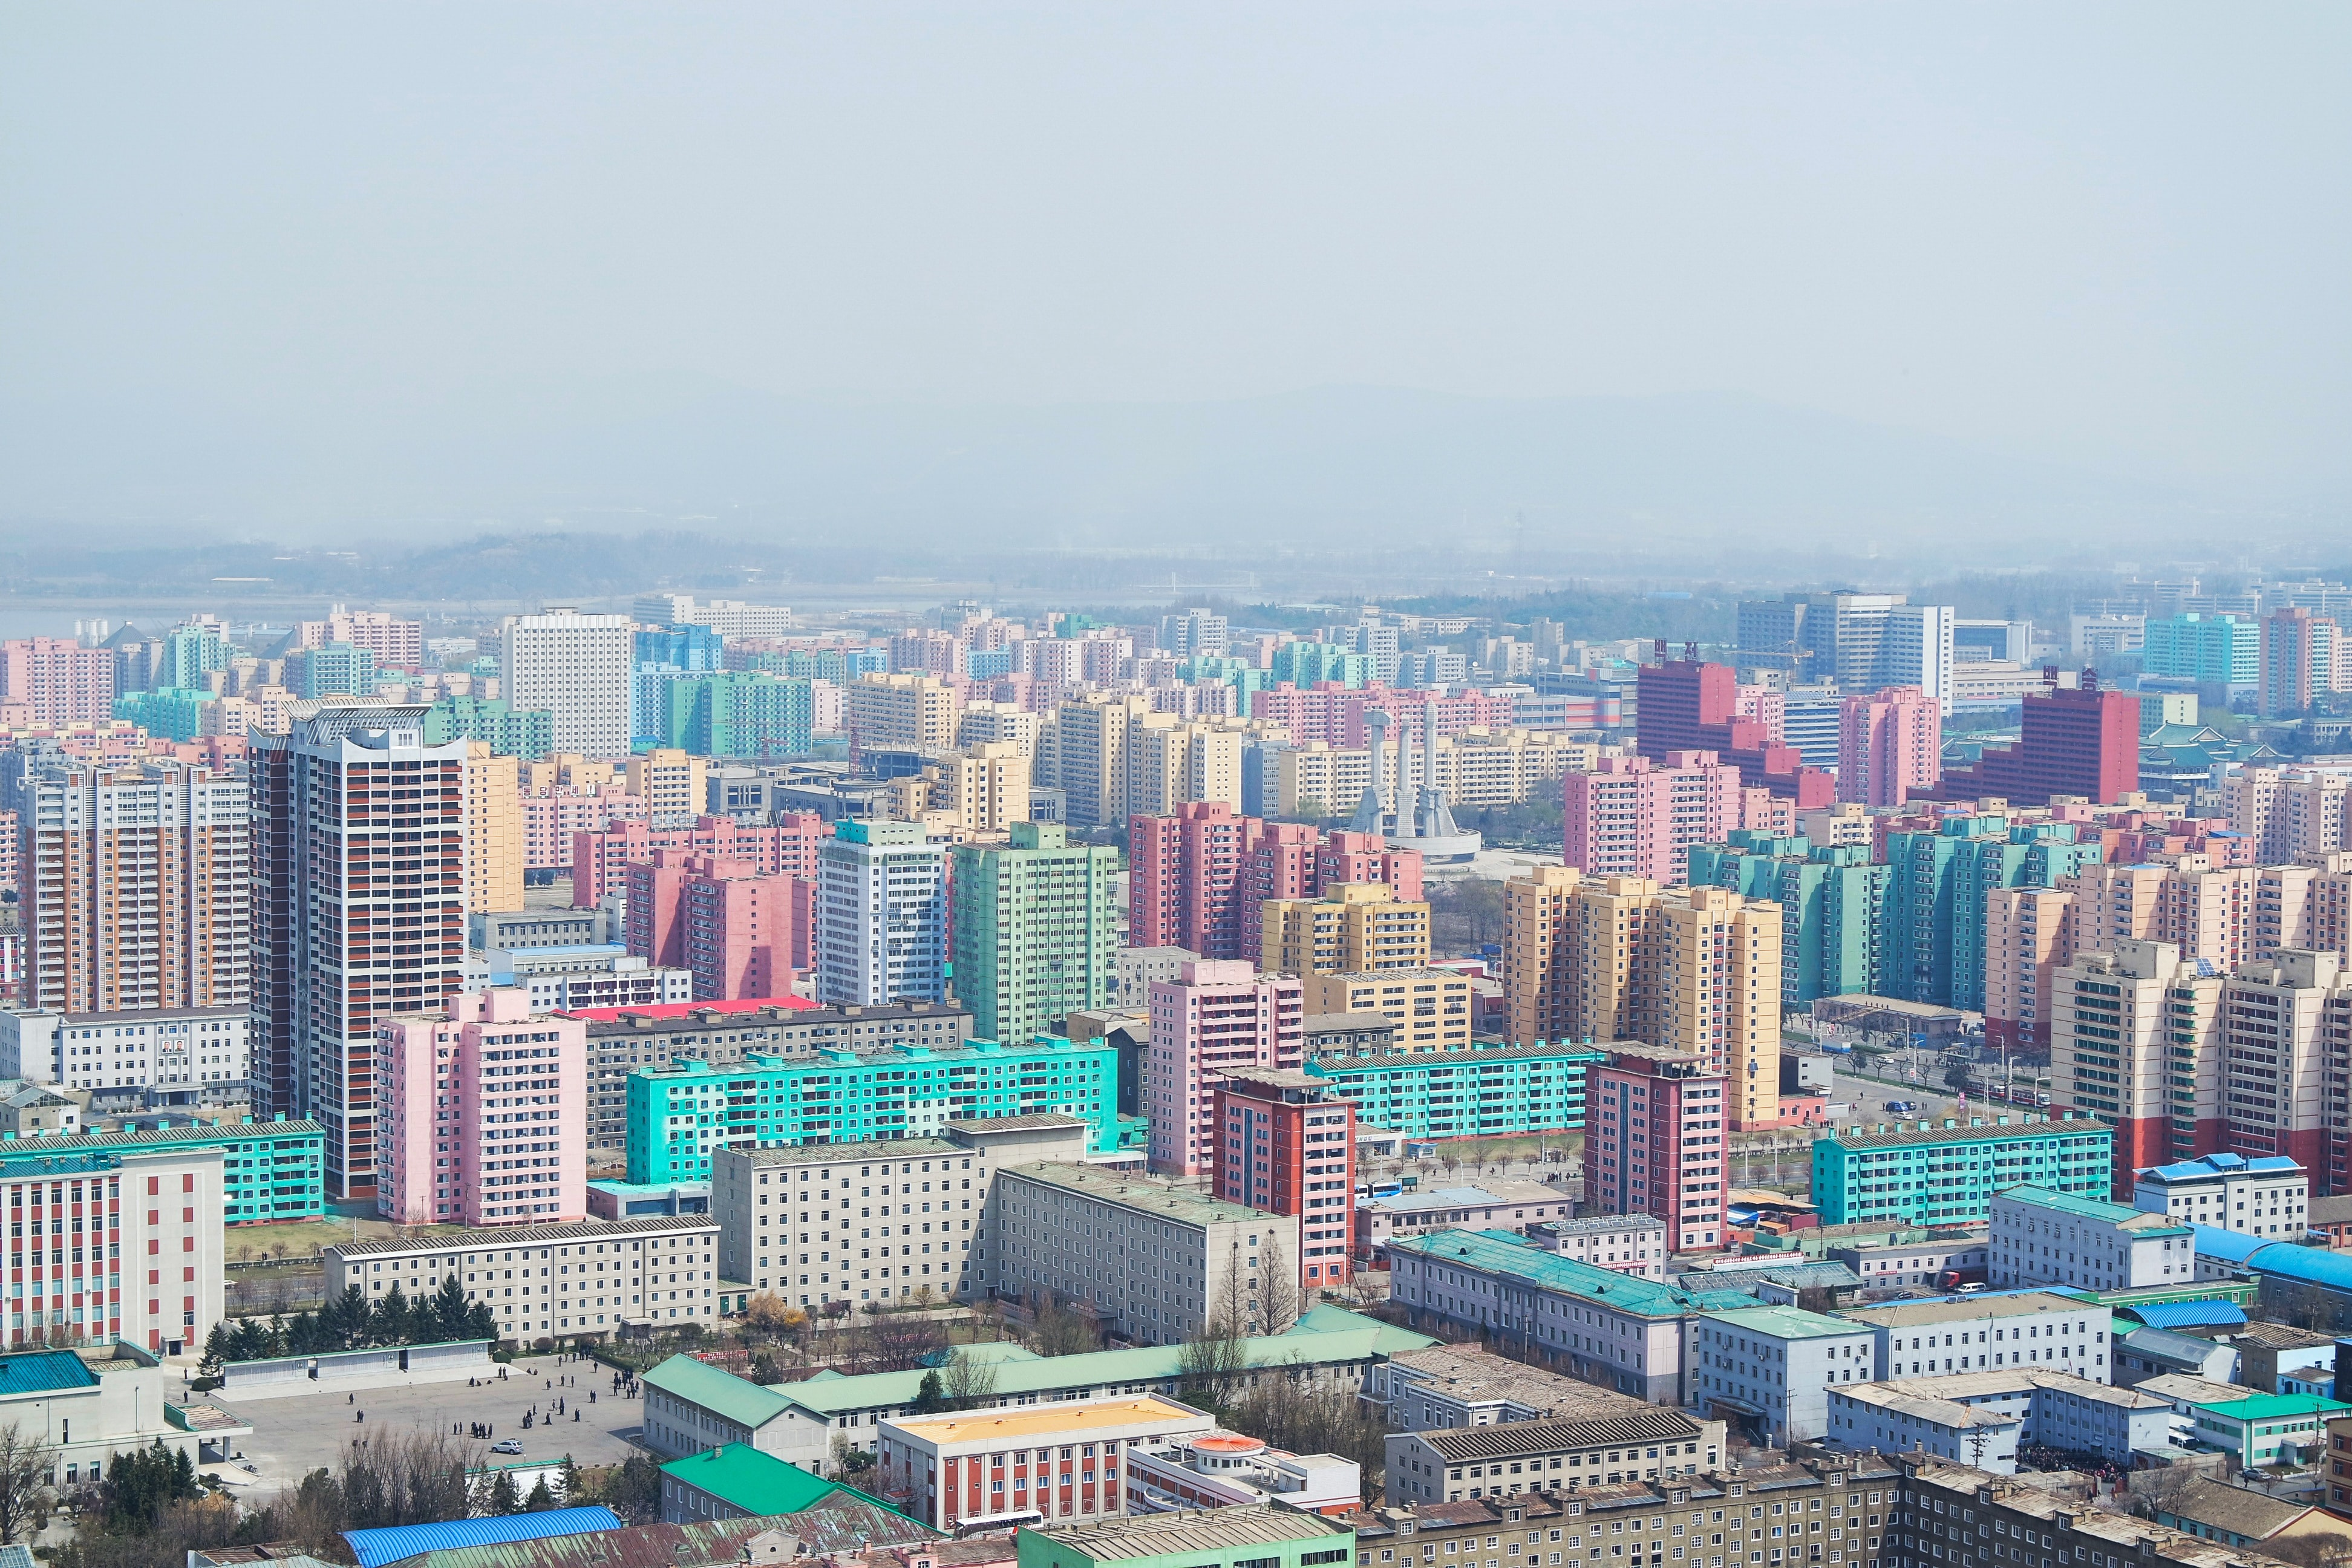 VOM Korea sent 23,000 Bibles into North Korea in 2020